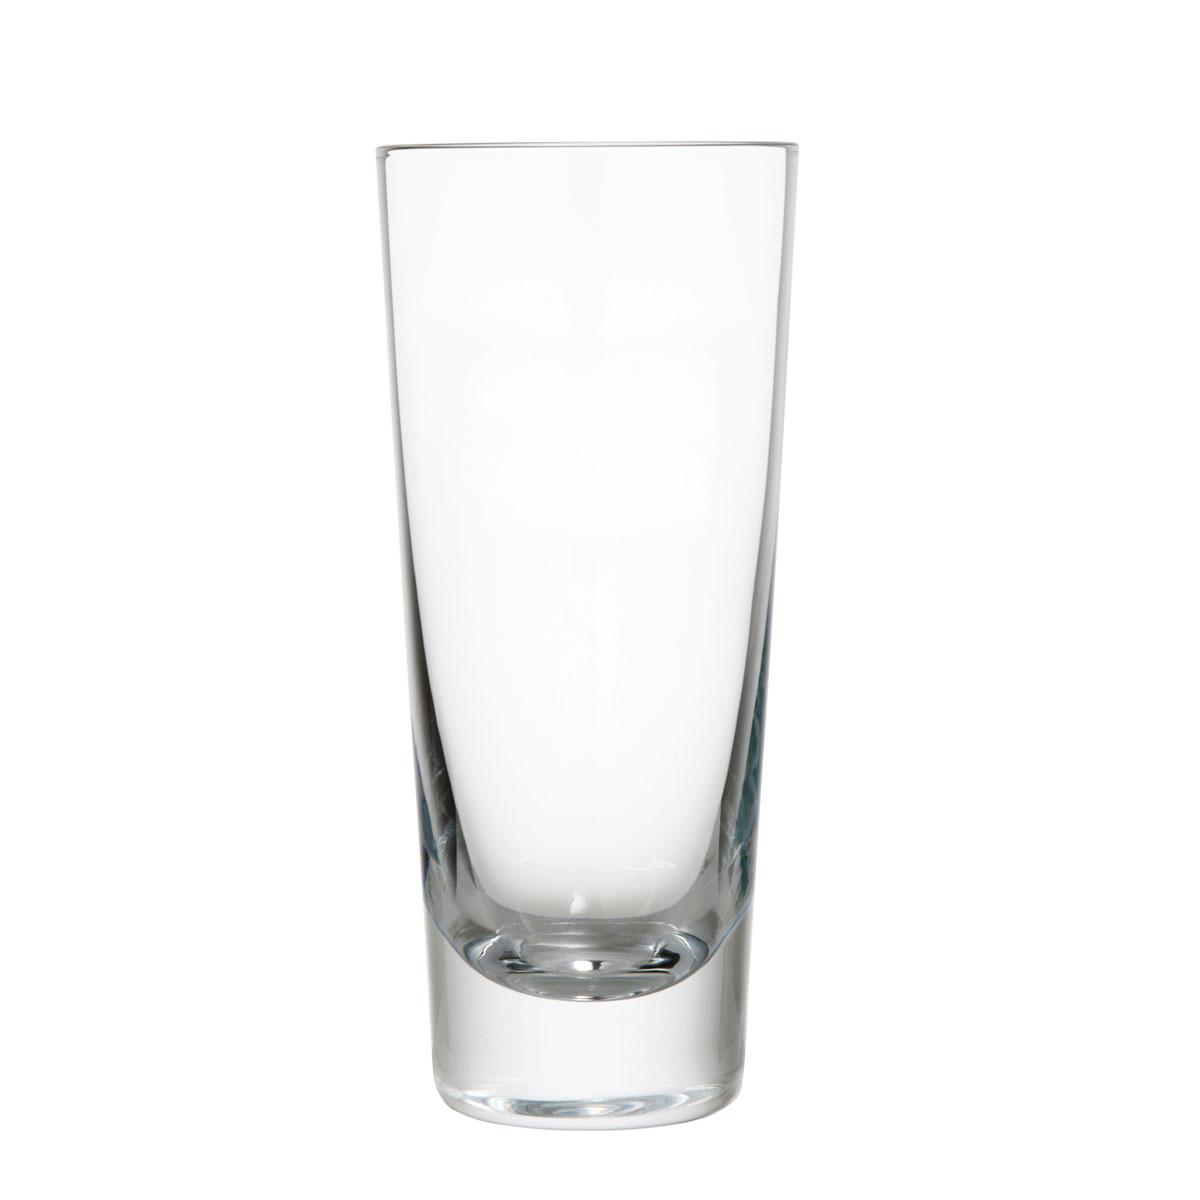 Schott Zwiesel Tritan Crystal, Tossa Crystal Hiball, Single